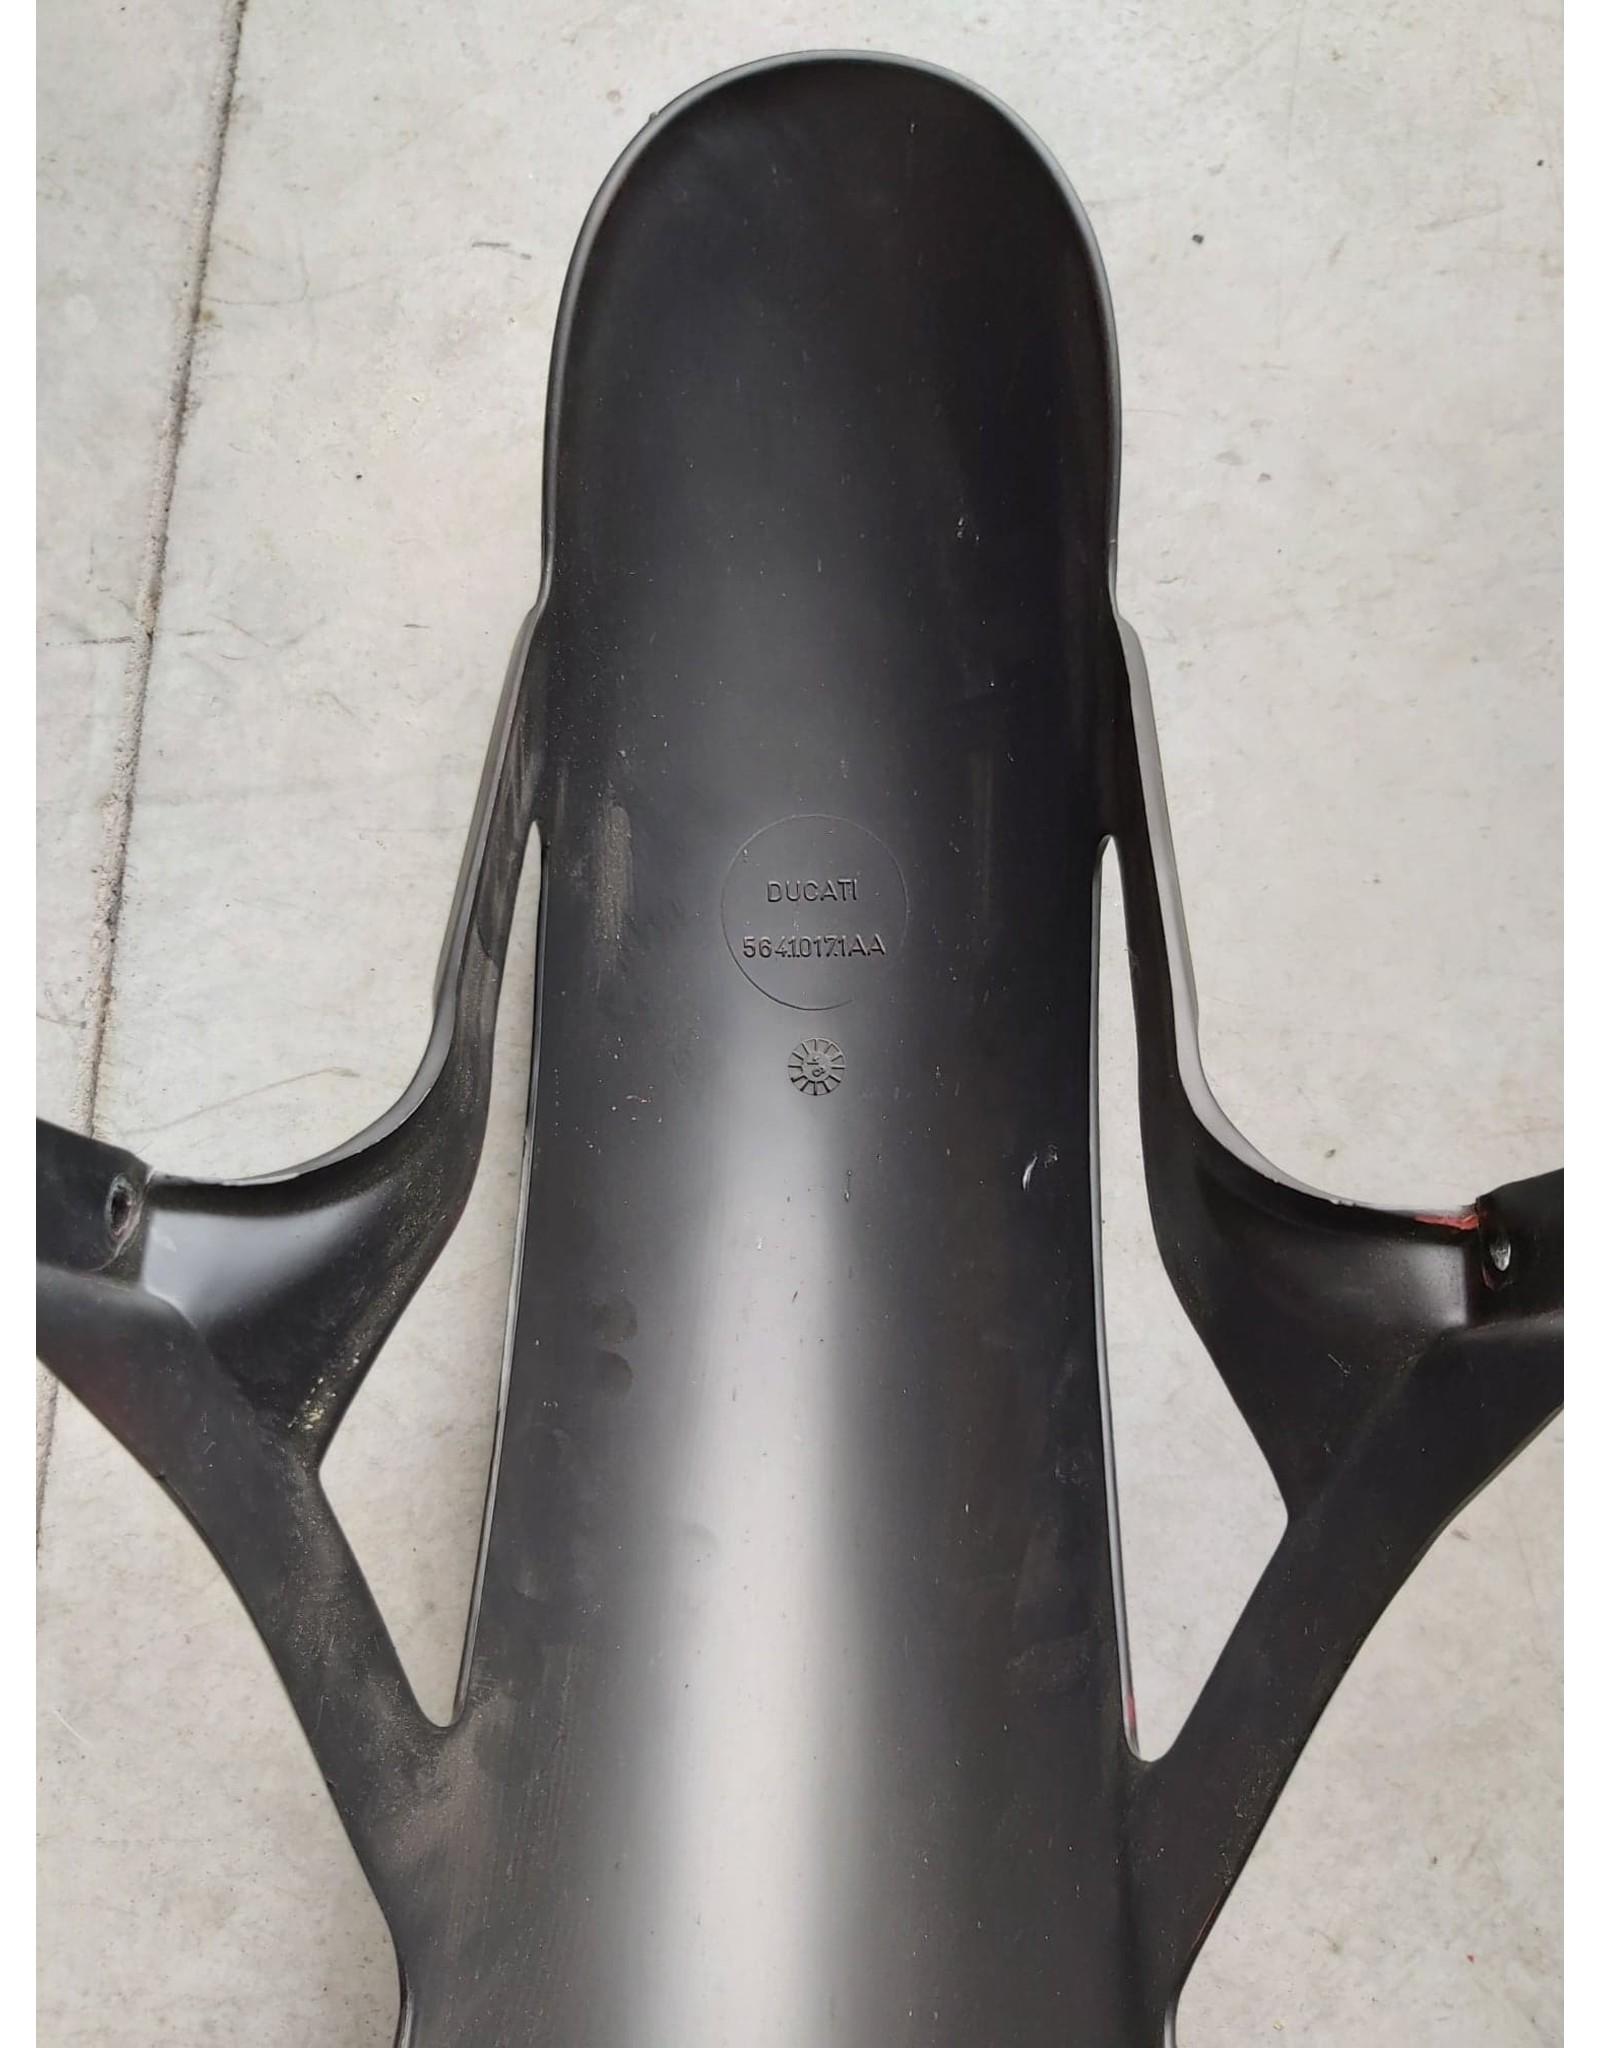 Ducati VOORSPATBORD DUCATI MONSTER